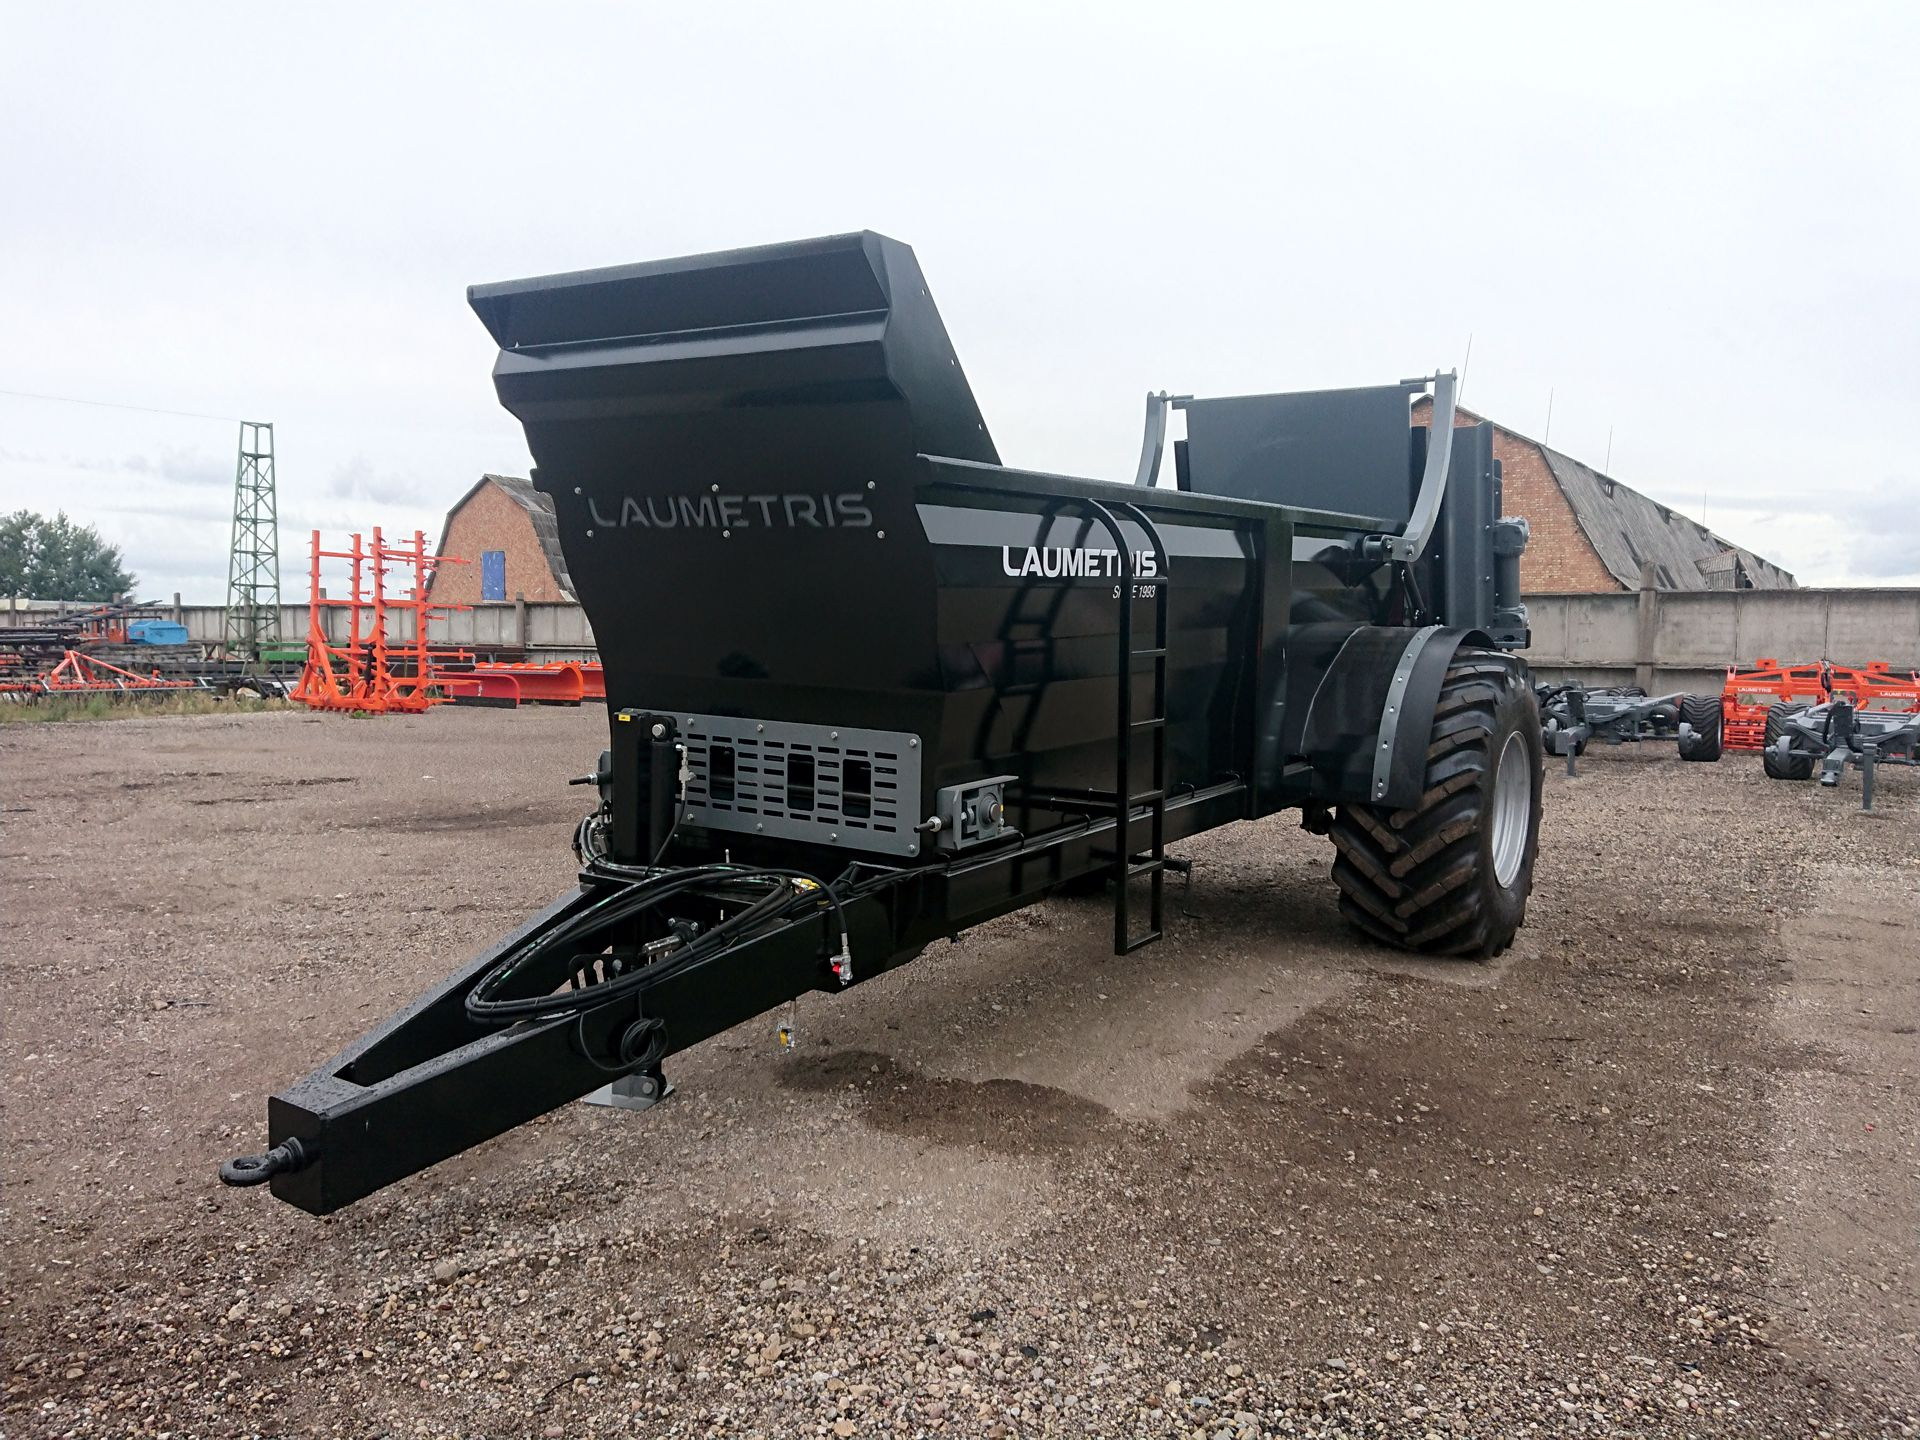 Gödselspridare MKL-10, Laumetris